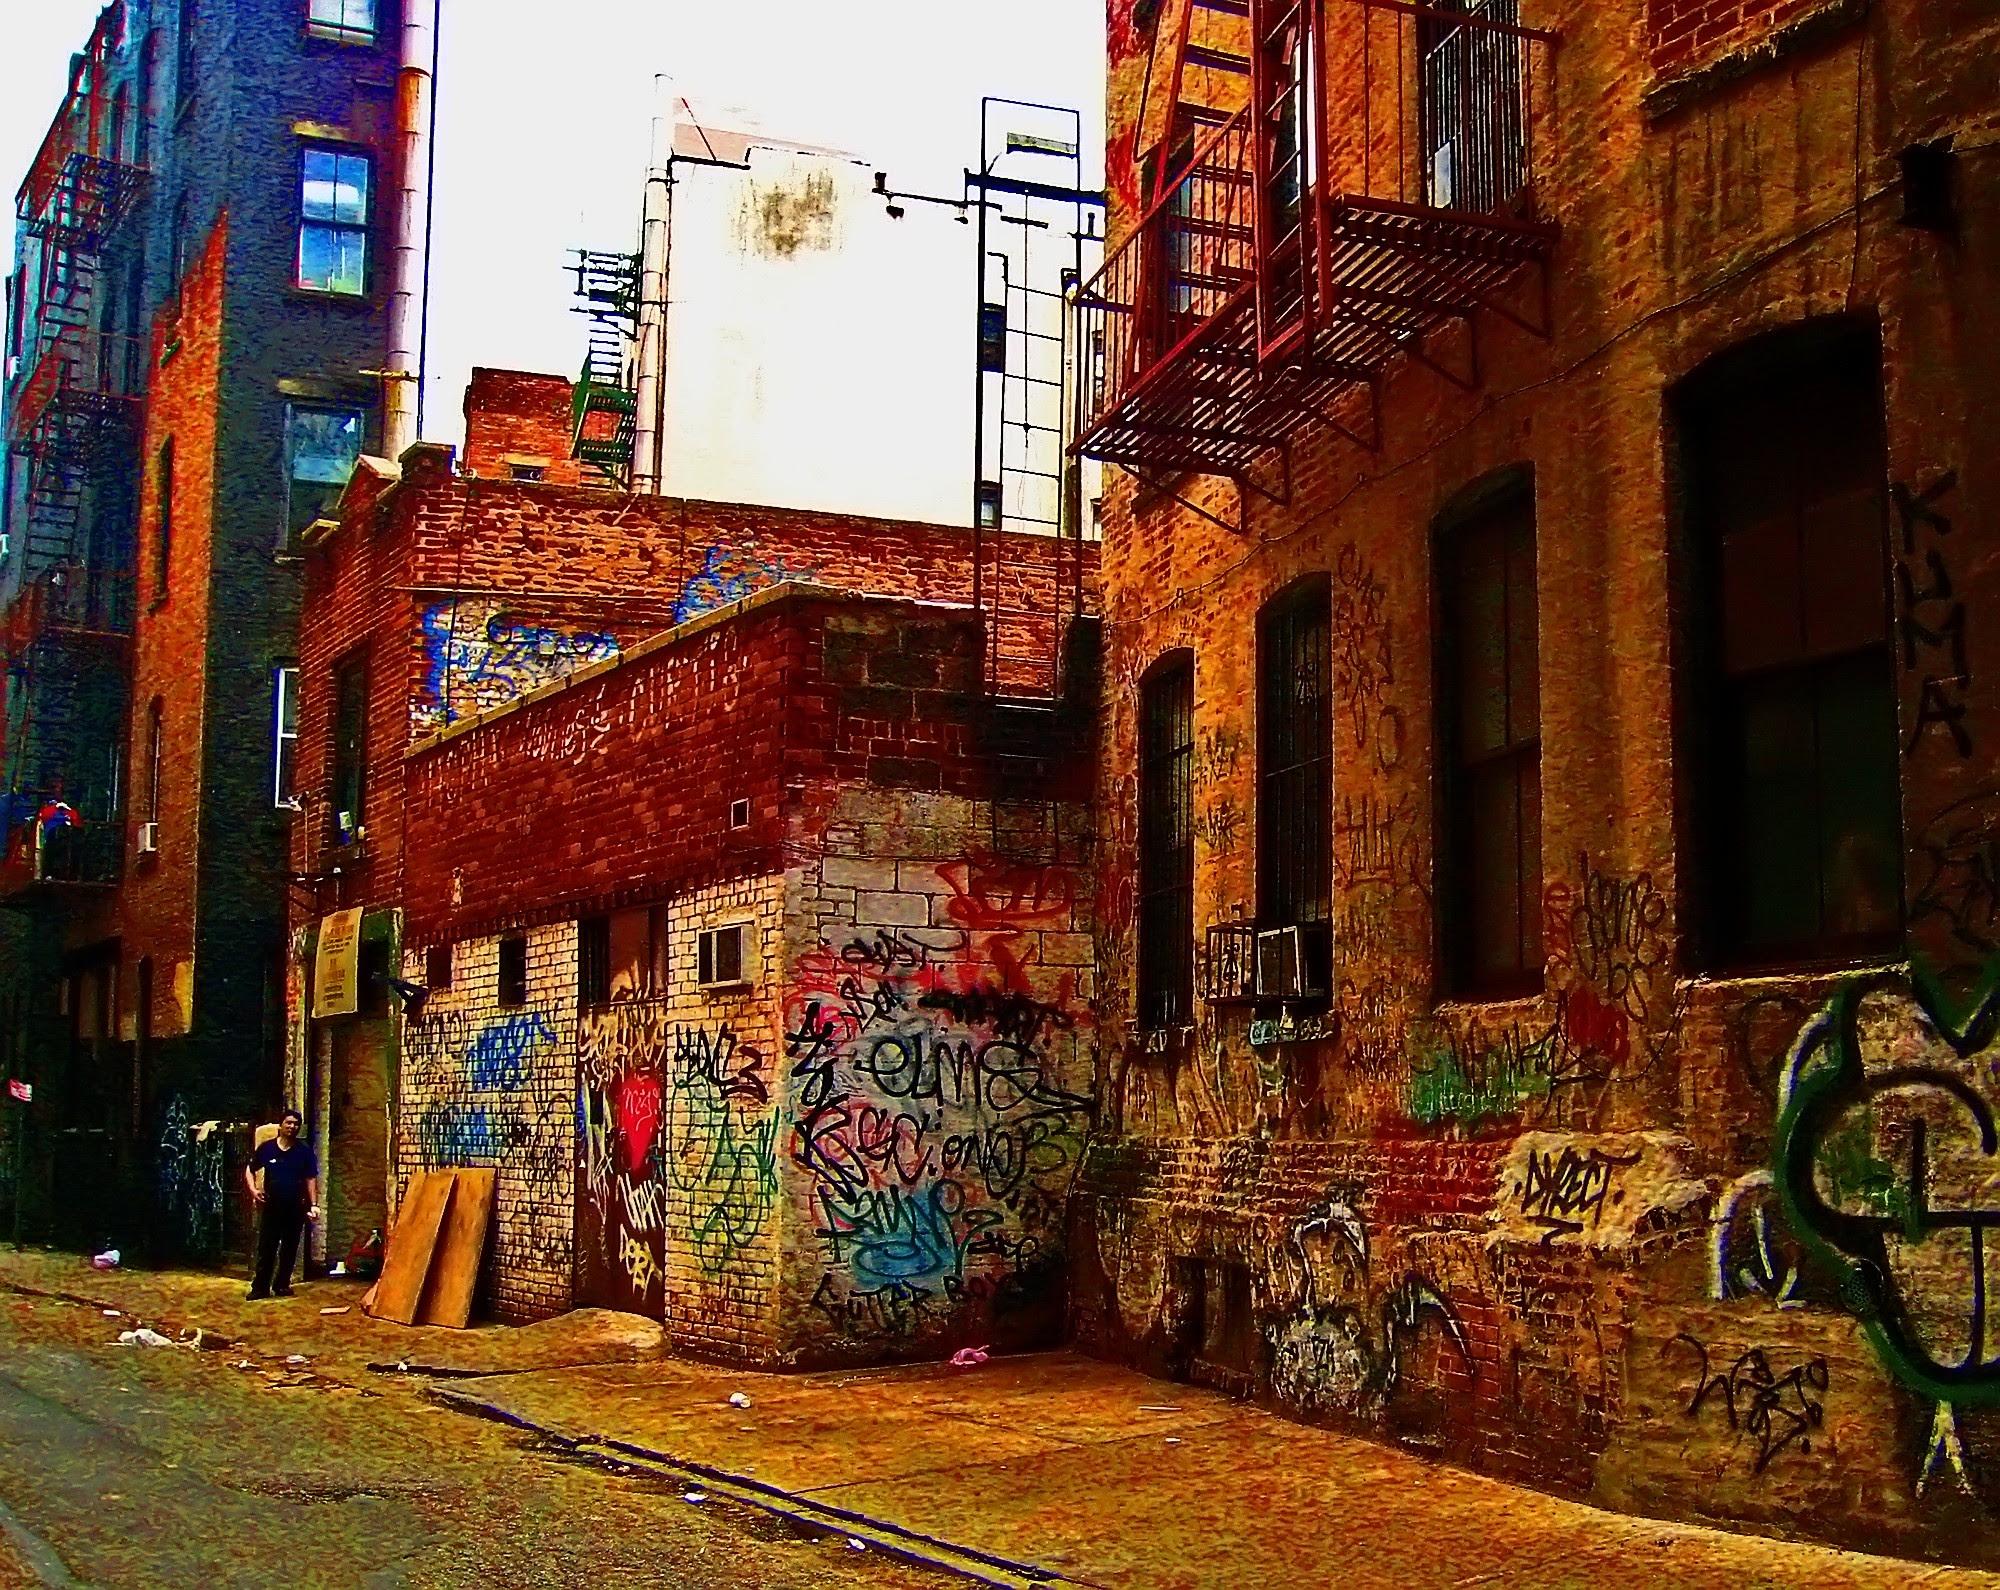 Mechanics Alley in living color